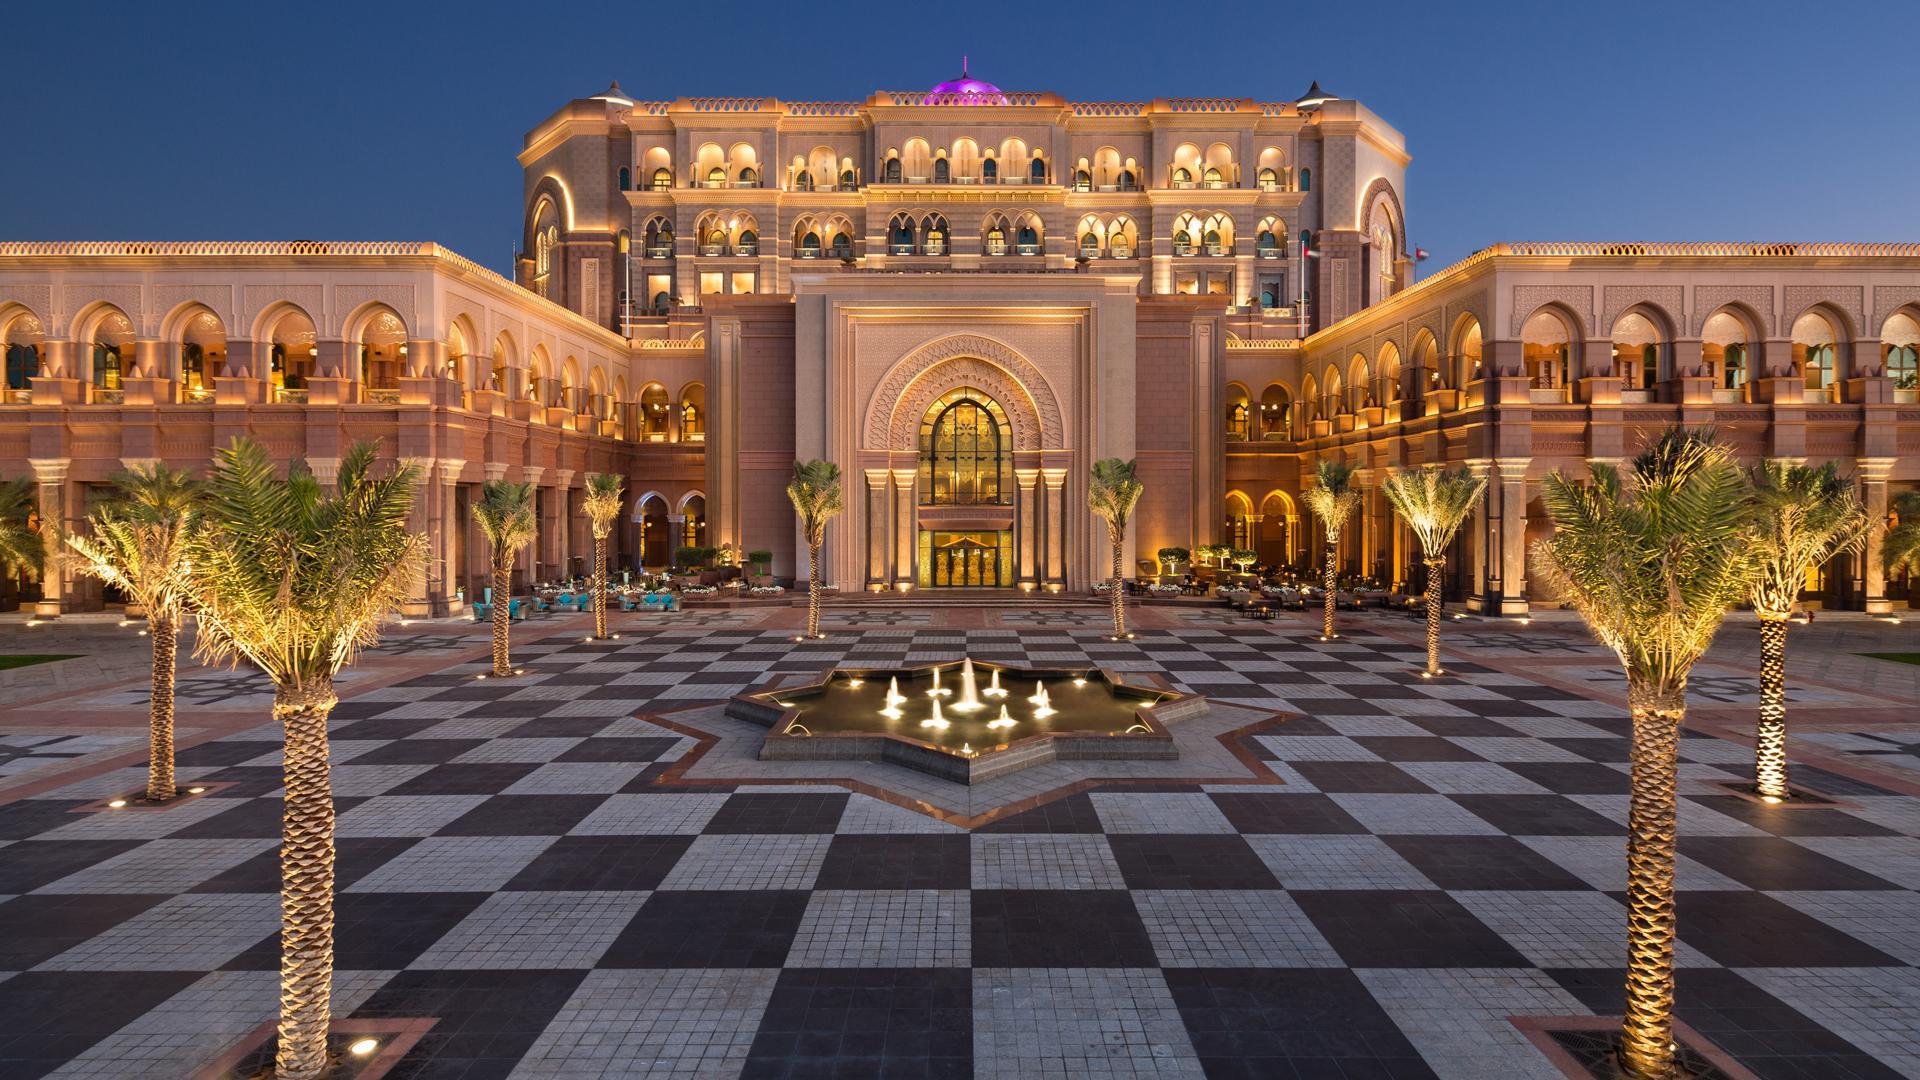 4.Abu Dhabi, UAE